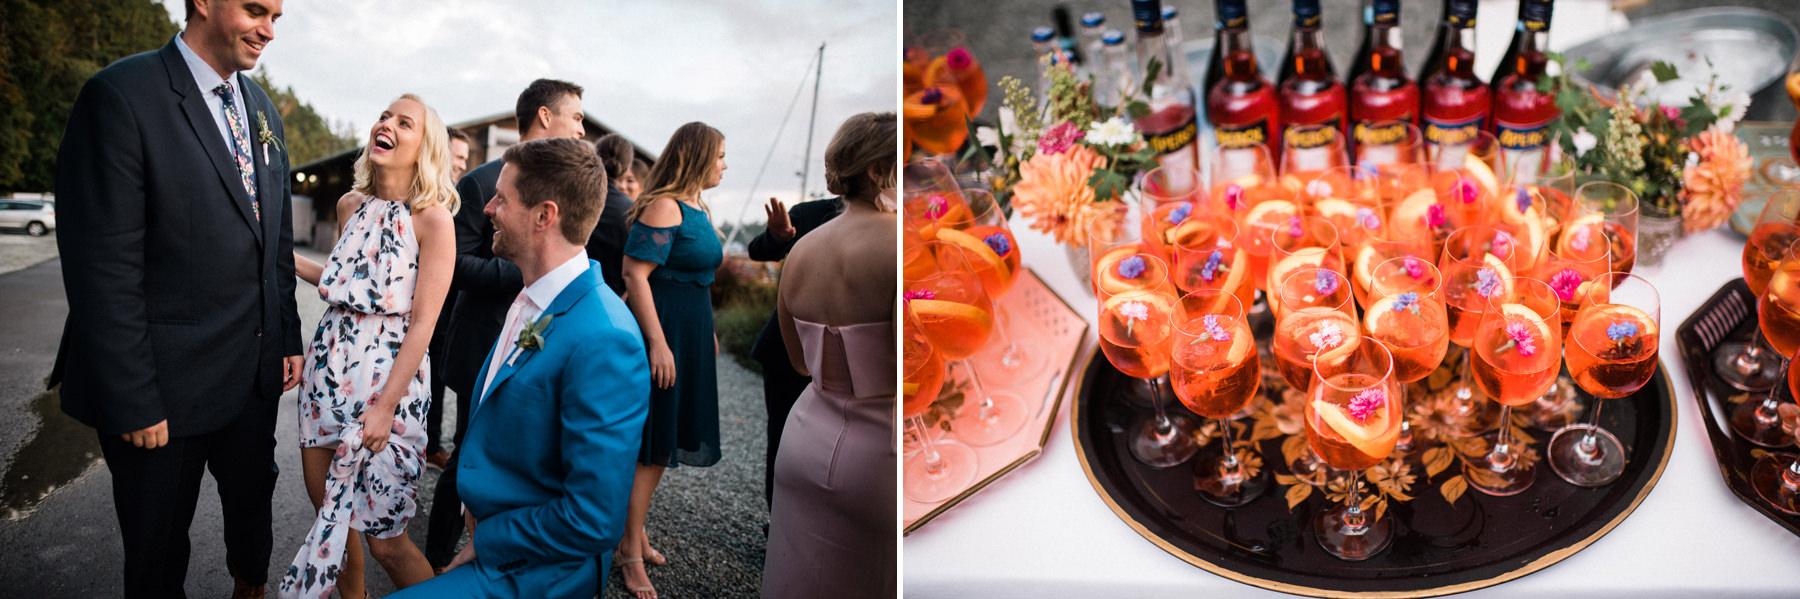 363-colorful-outdoor-lopez-island-wedding.jpg